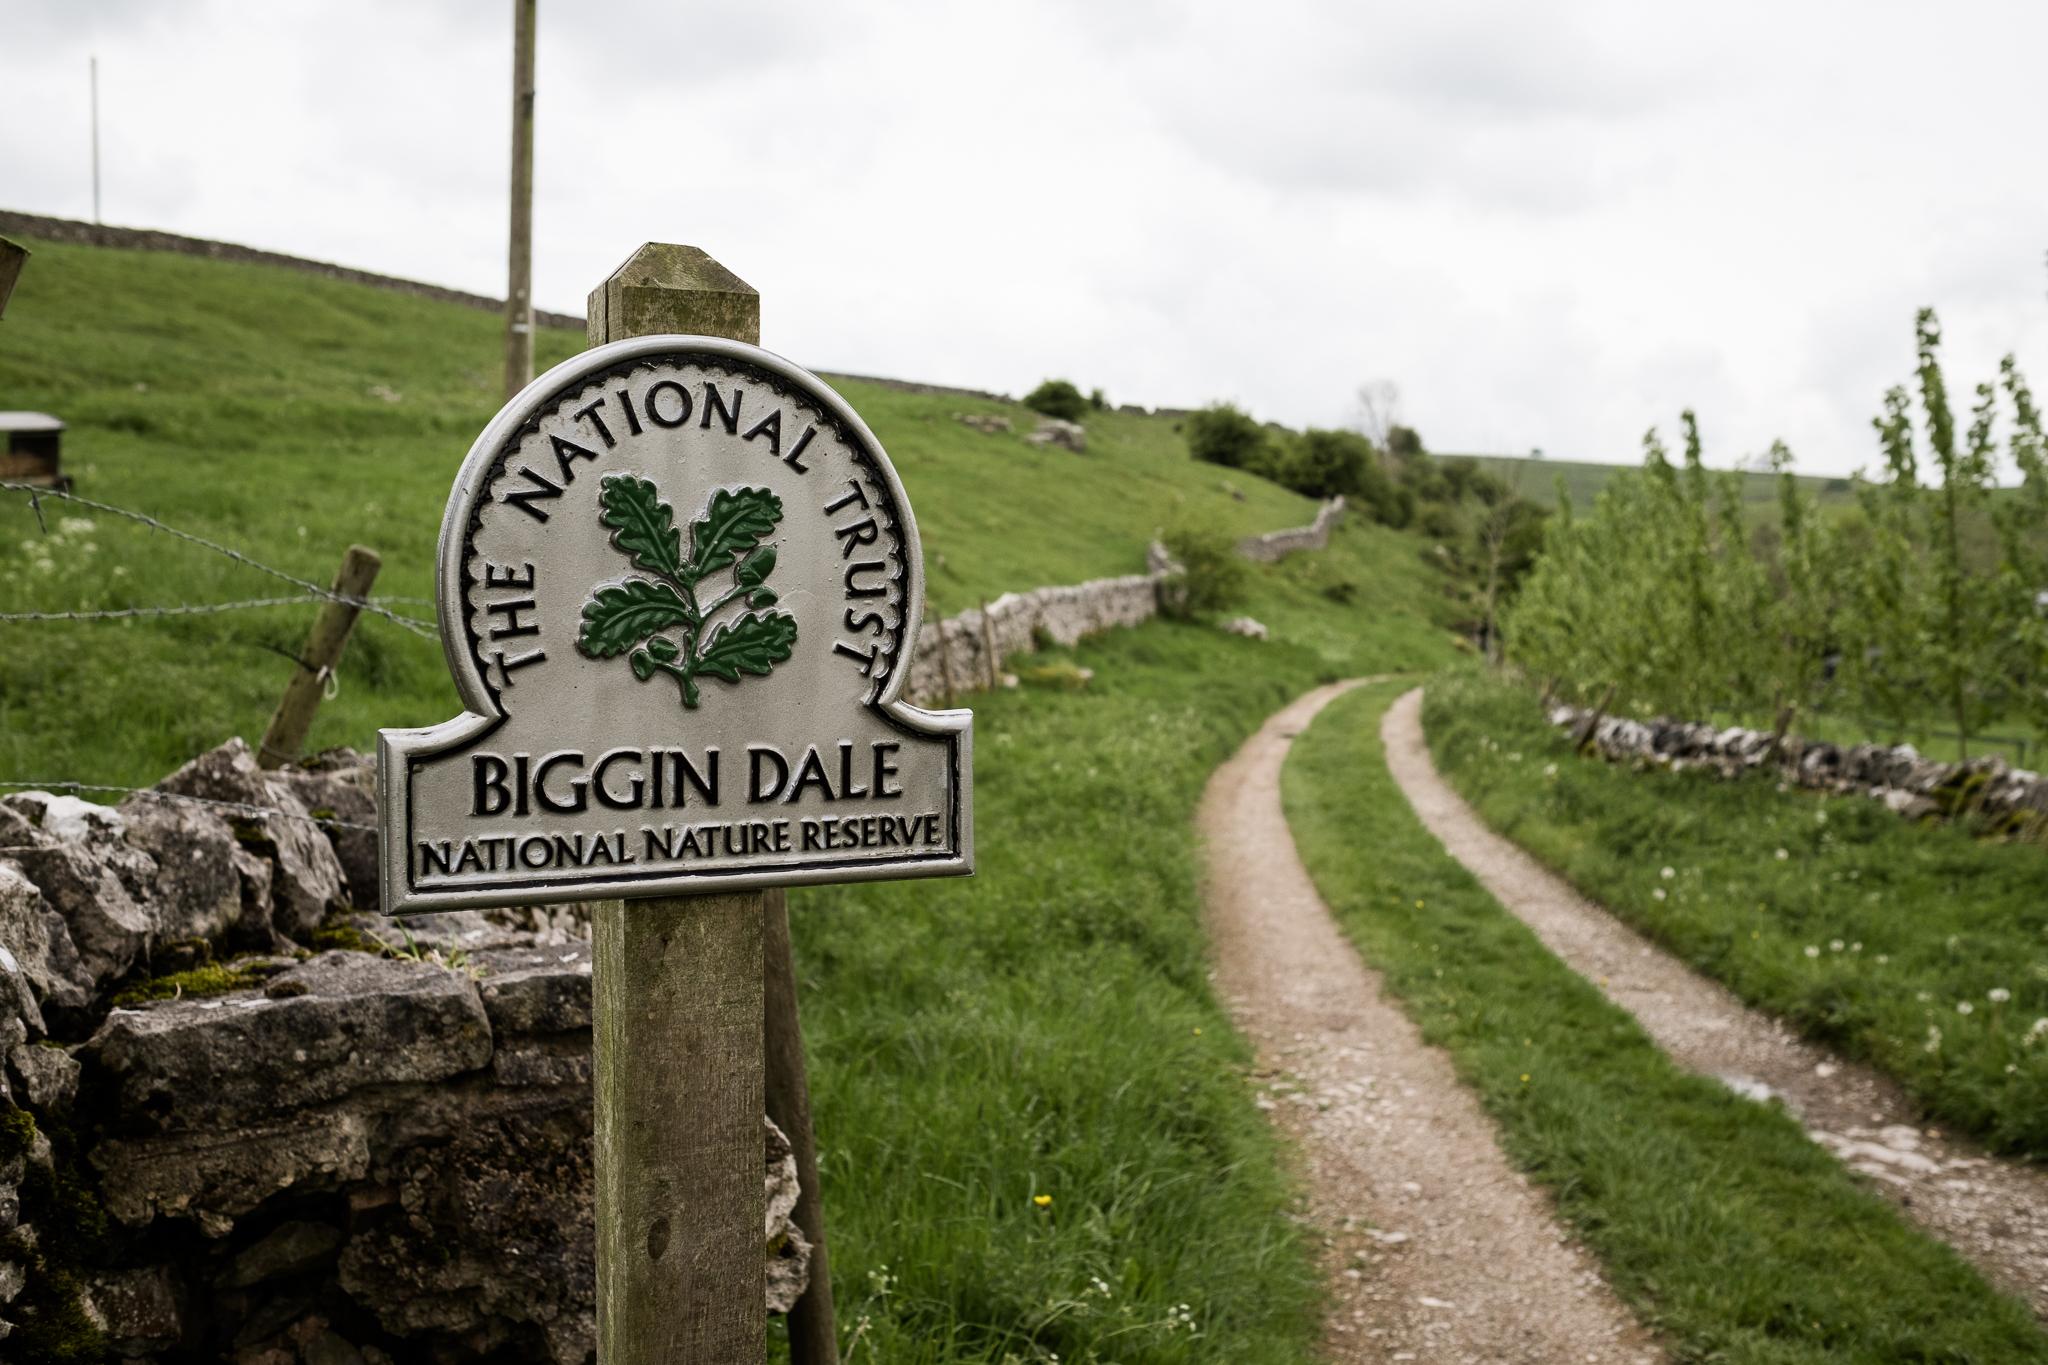 05.19.2017 The Photowalk Network Get Some Fresh Air Photowalk at Hartington and Biggin, Staffordshire Peak District National Trust-25.jpg